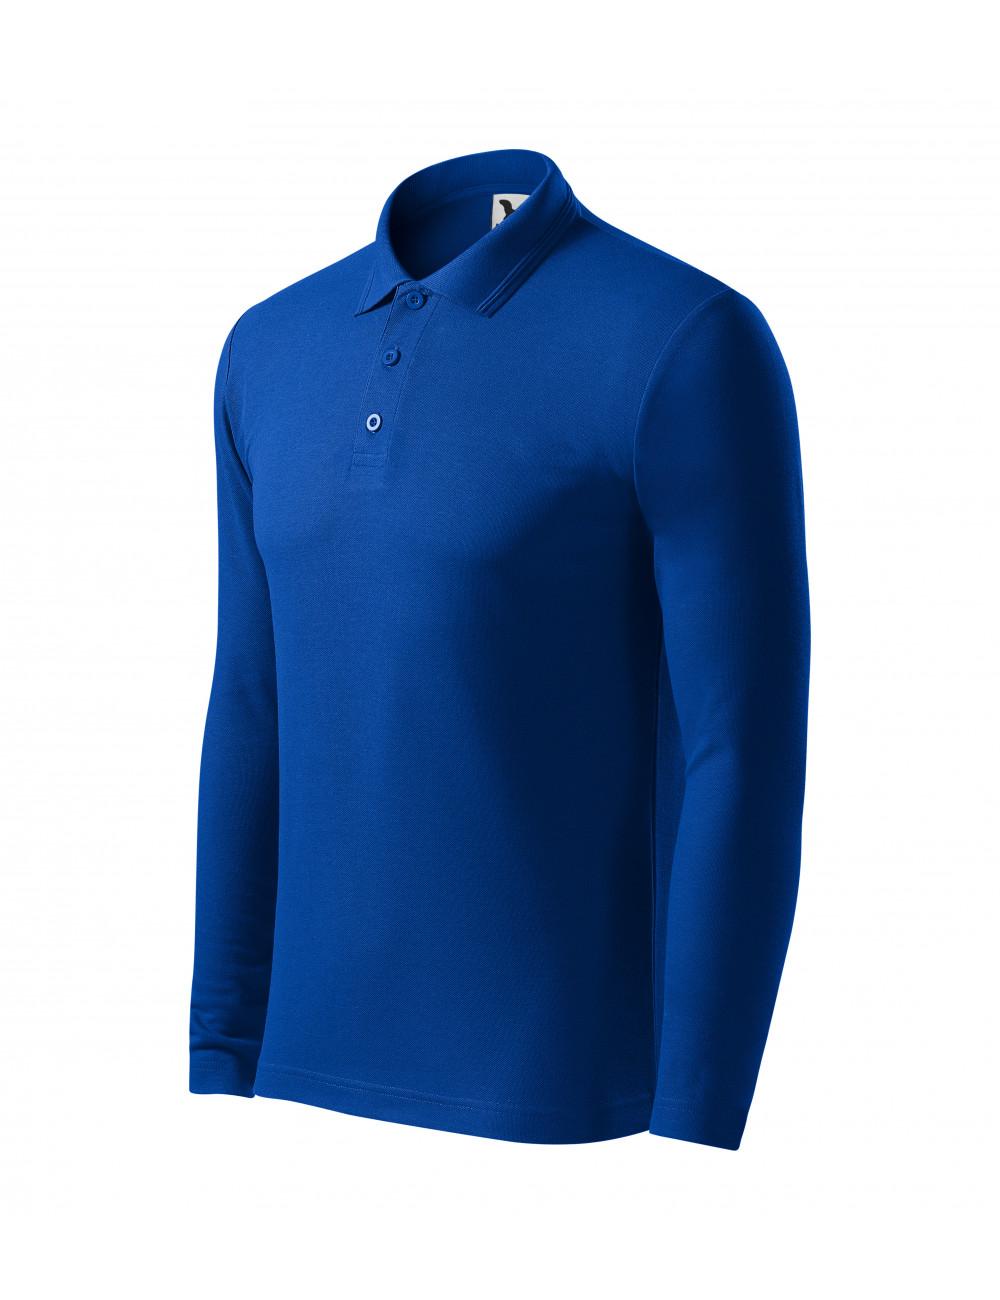 Adler MALFINI Koszulka polo męska Pique Polo LS 221 chabrowy